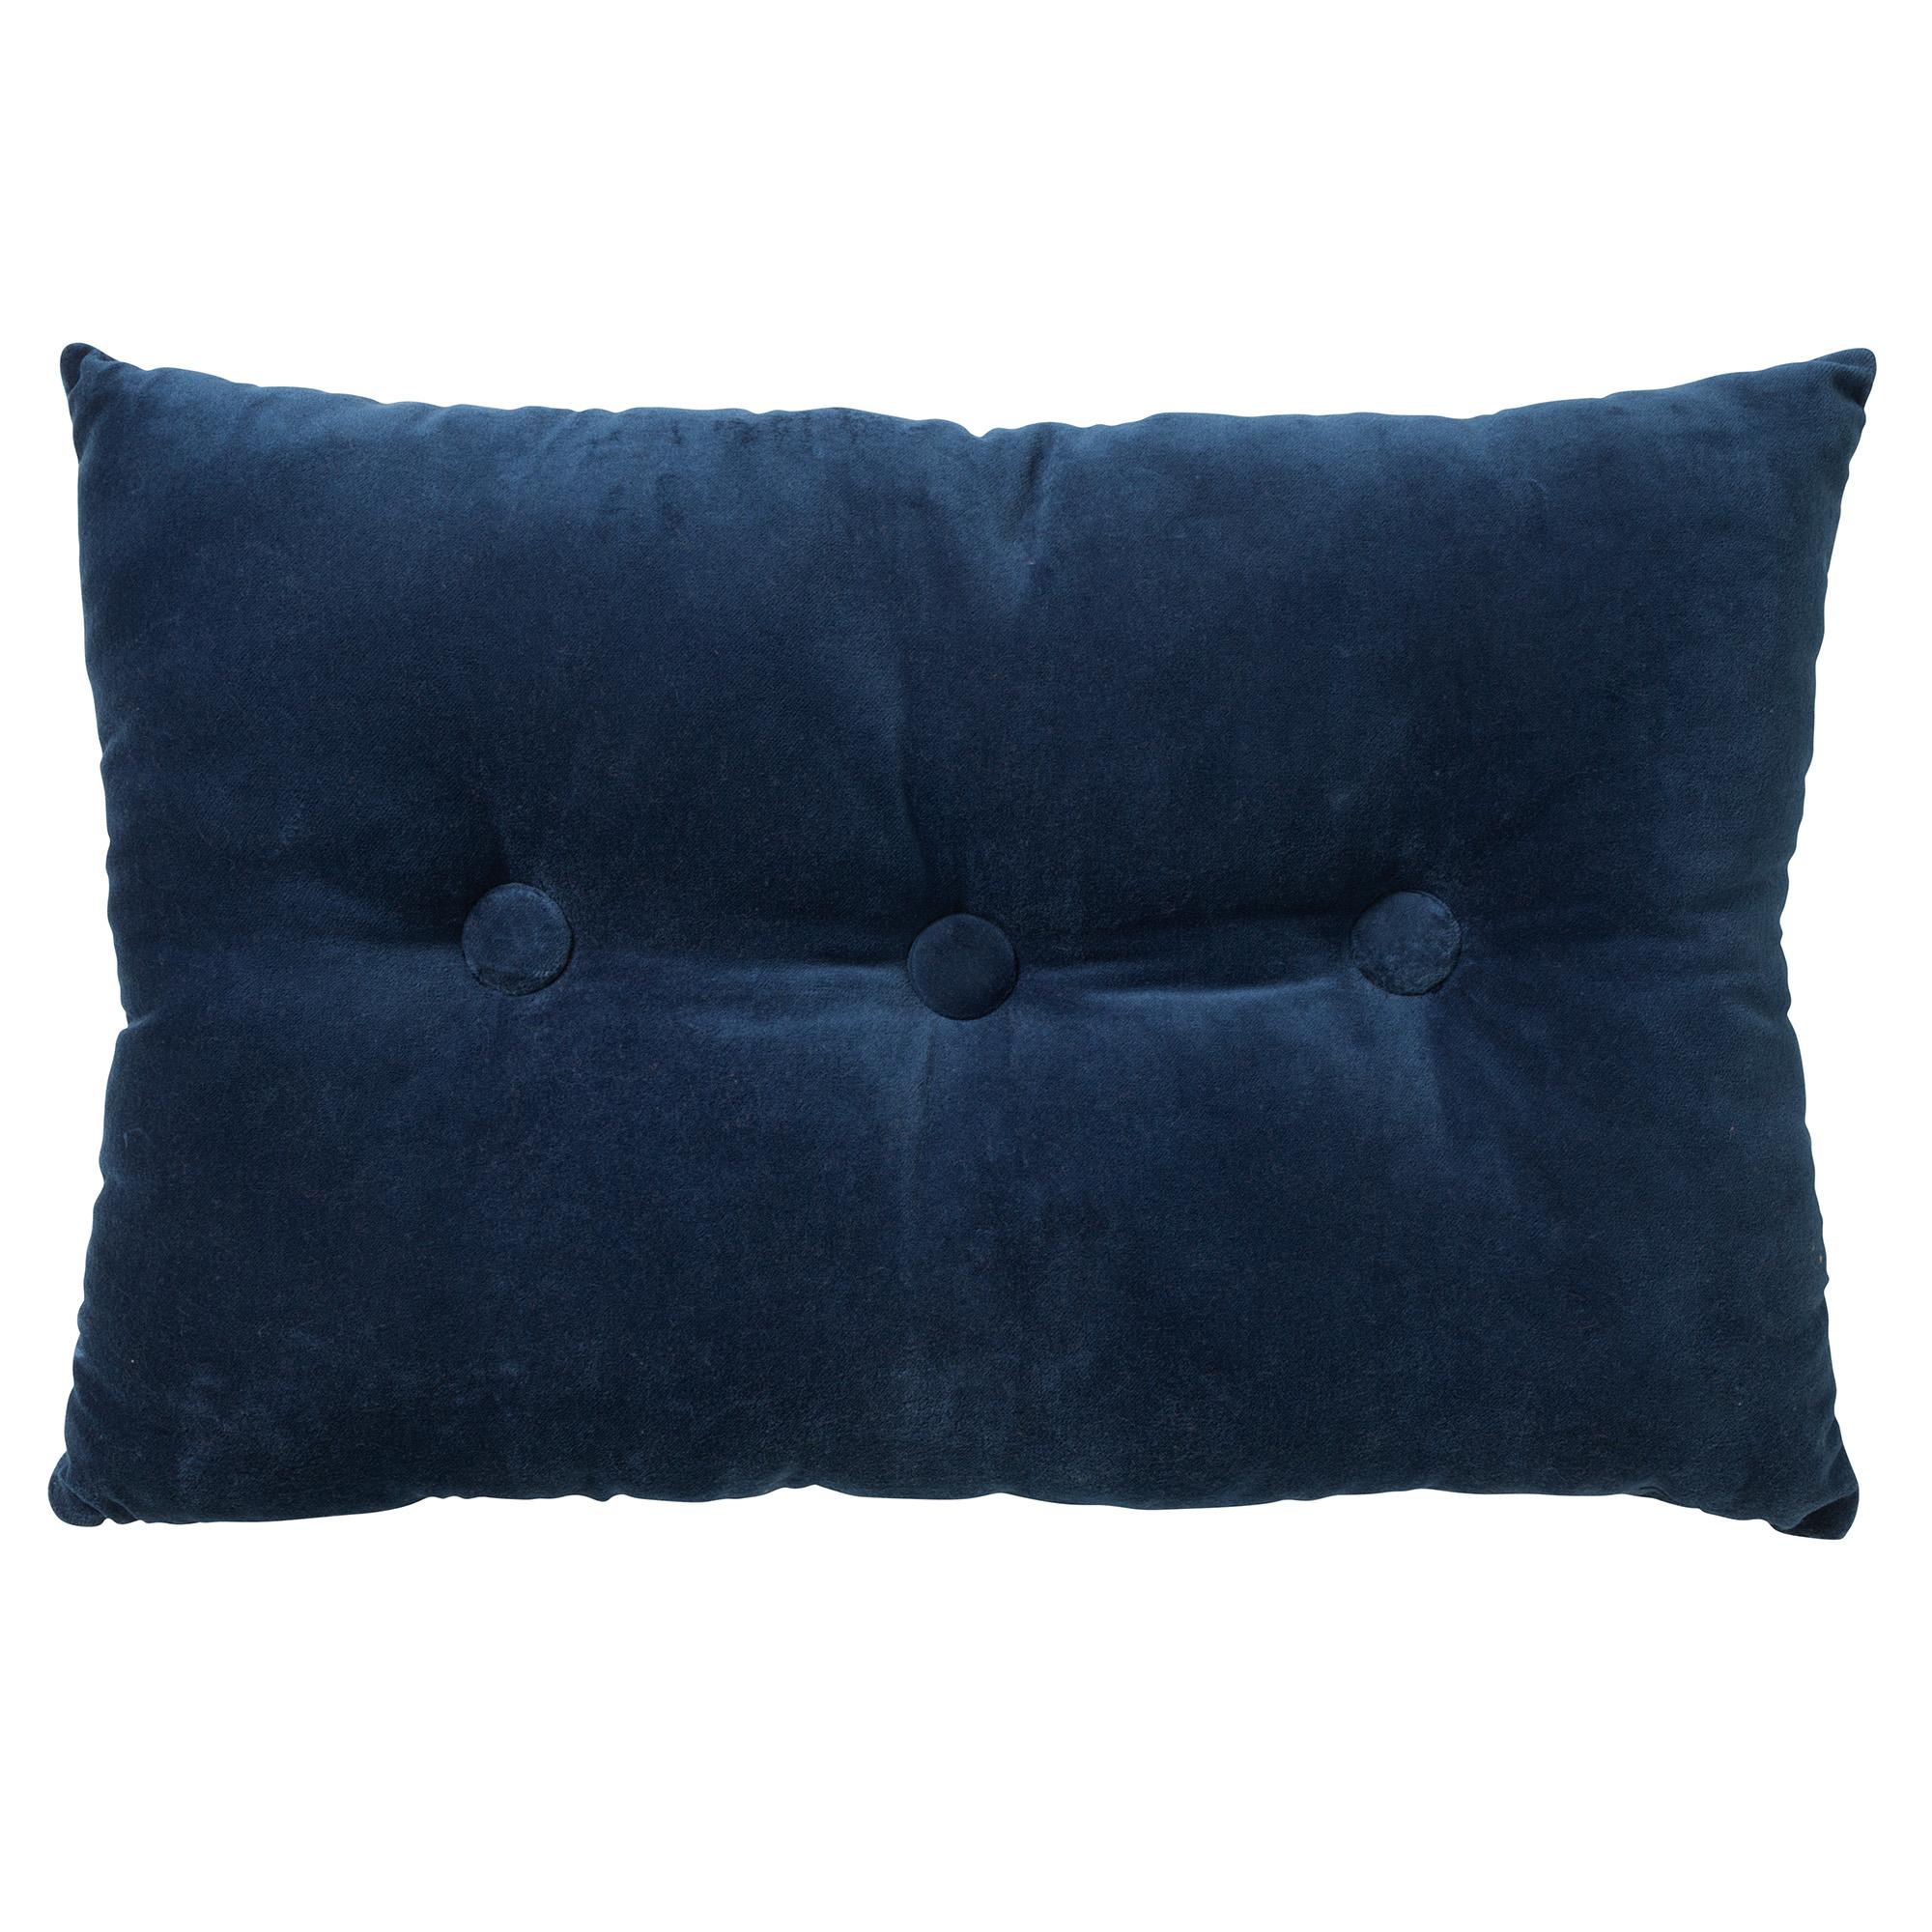 Kussen Valerie 40x60 cm Insignia Blue